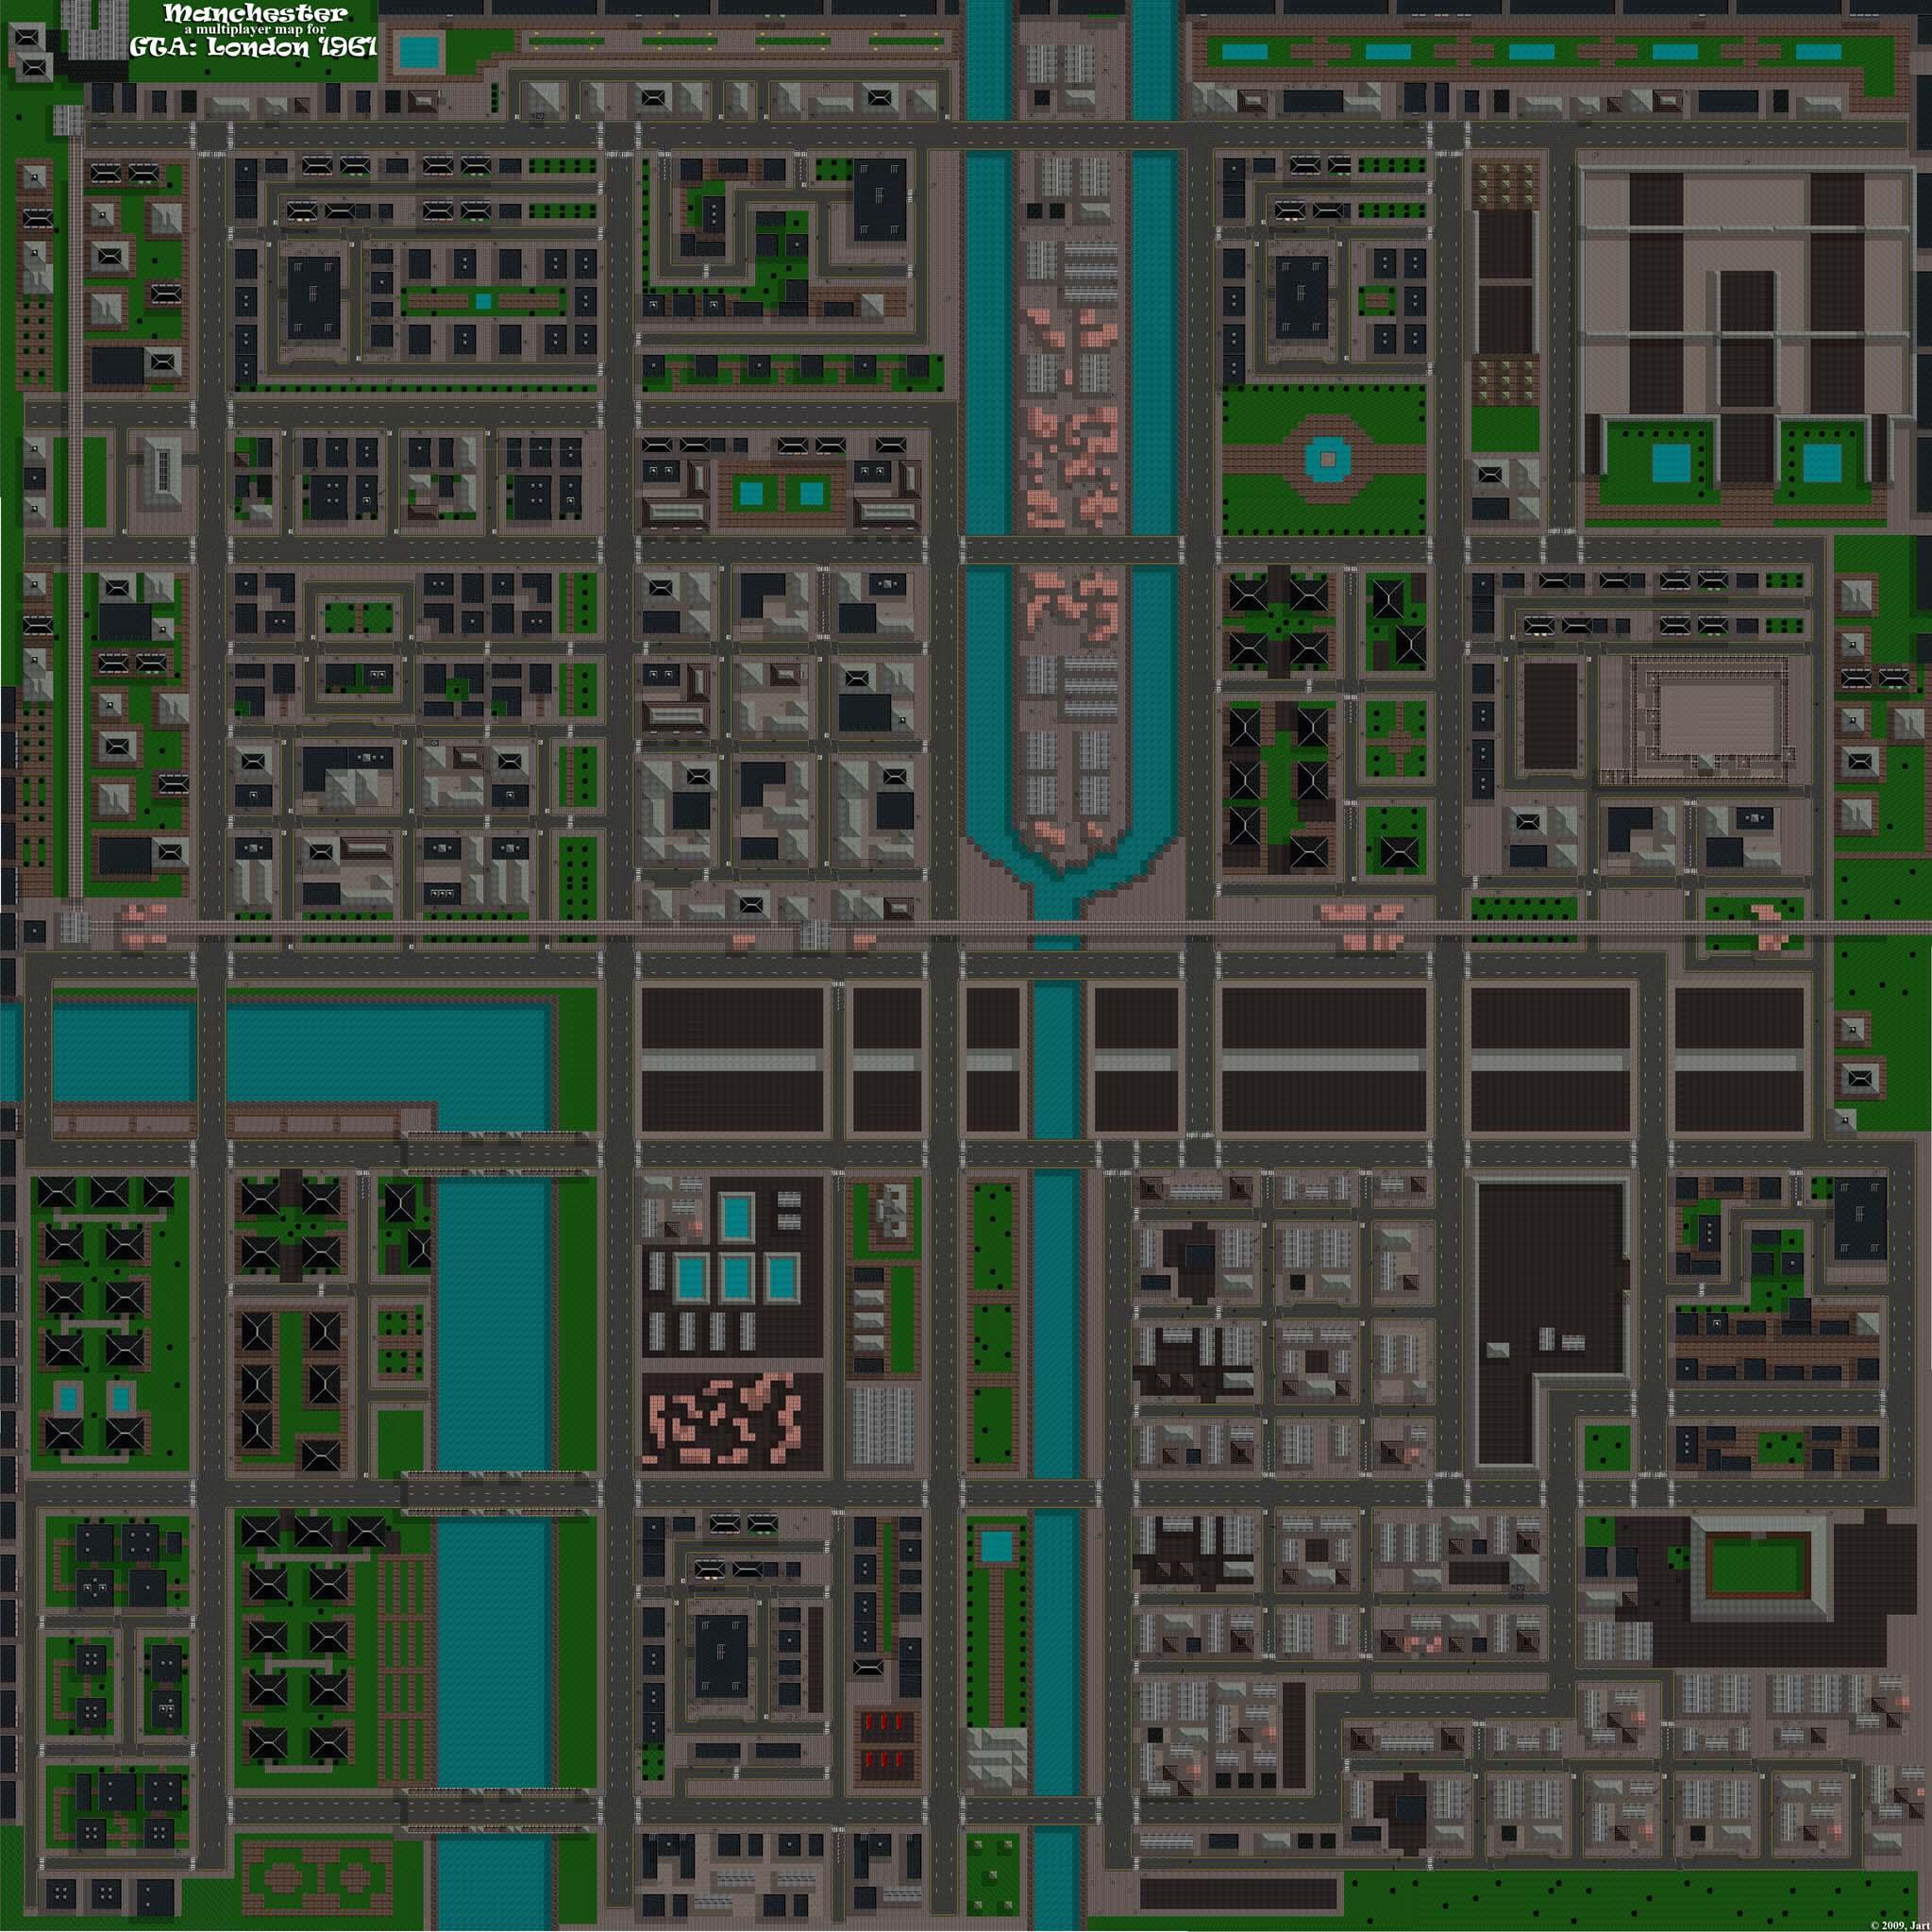 Manchester: a multiplayer map for GTA:London 1961. Основные постройки